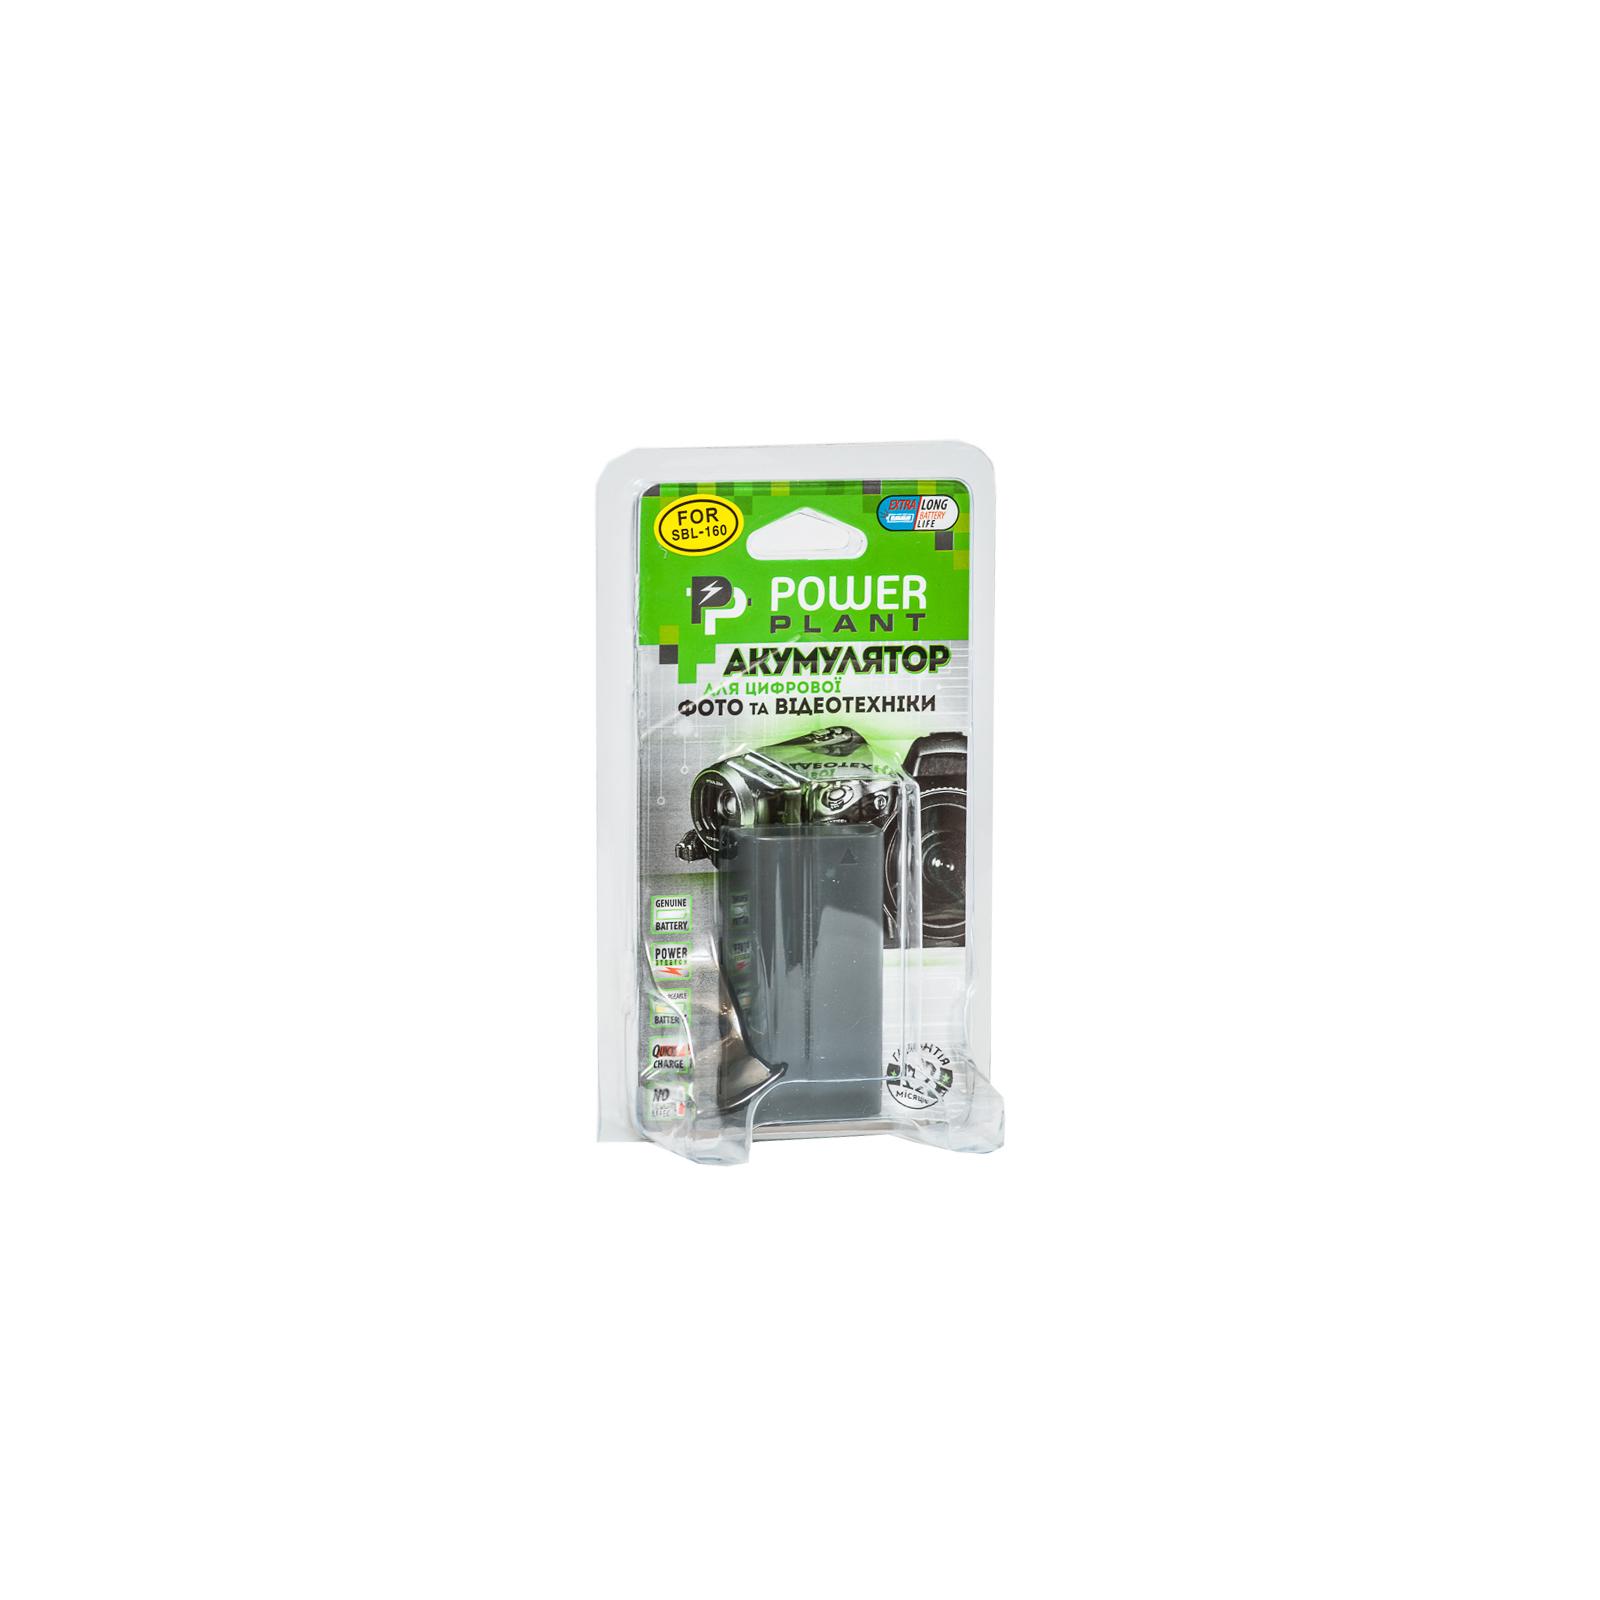 Аккумулятор к фото/видео PowerPlant Samsung SB-L160 (DV00DV1277) изображение 3